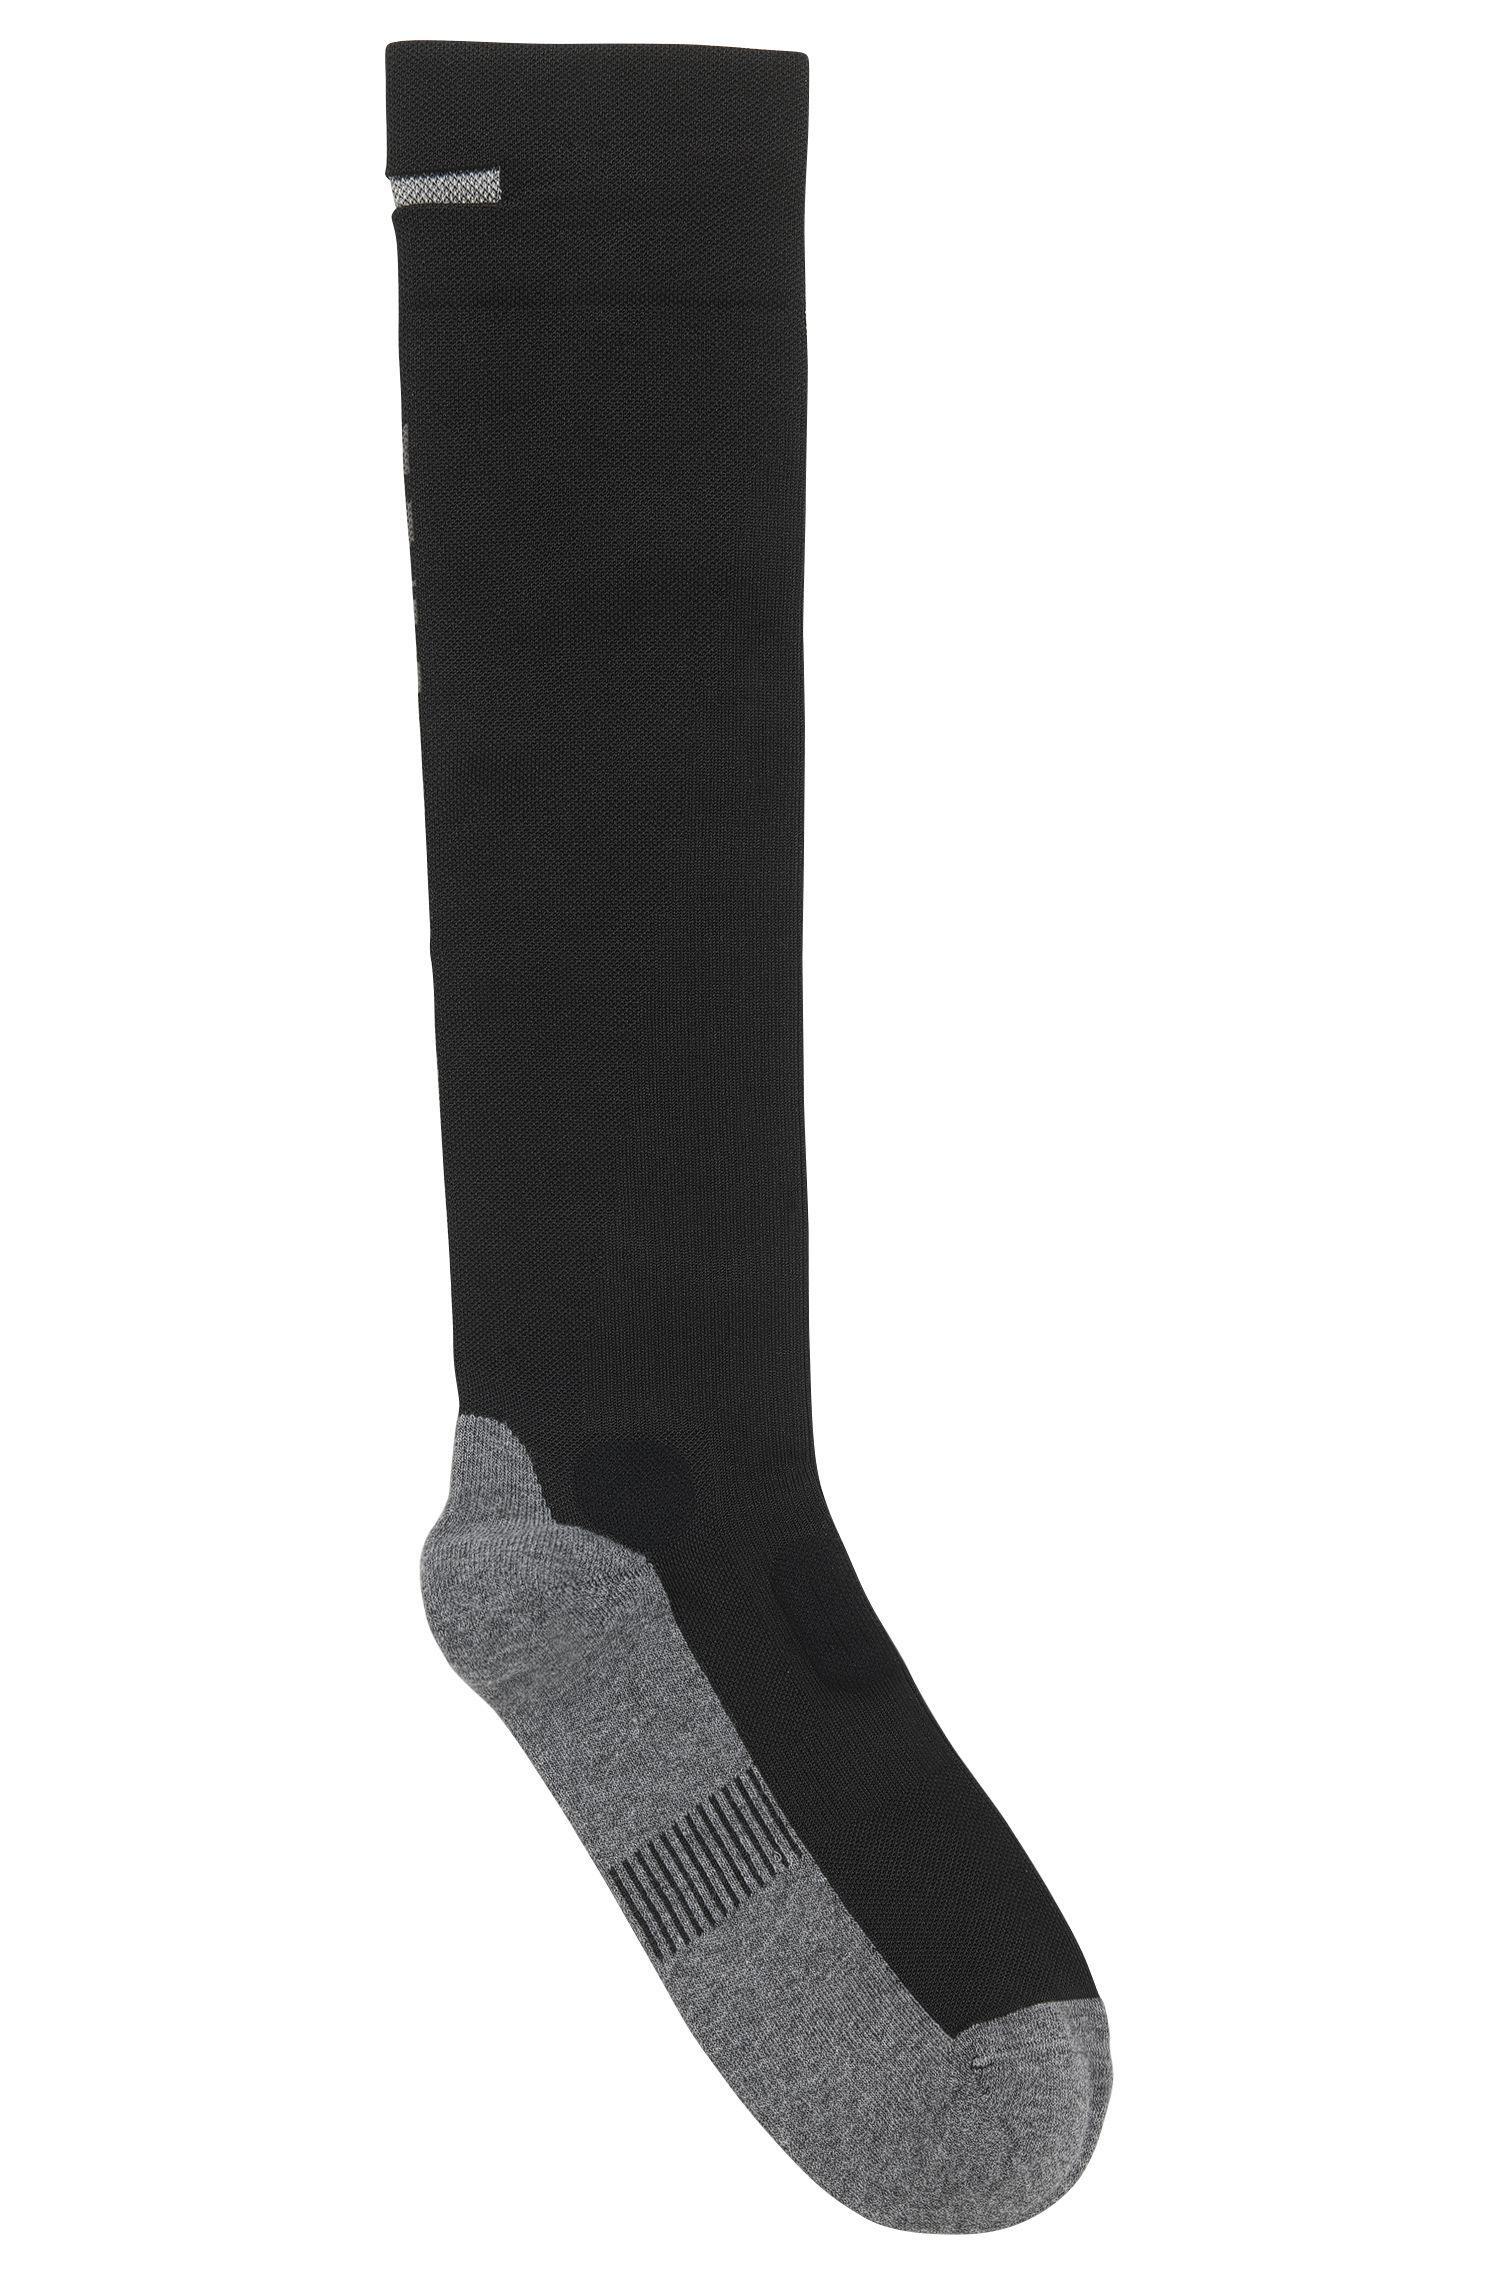 Knee-Length Compression Socks | KH Performance CMax